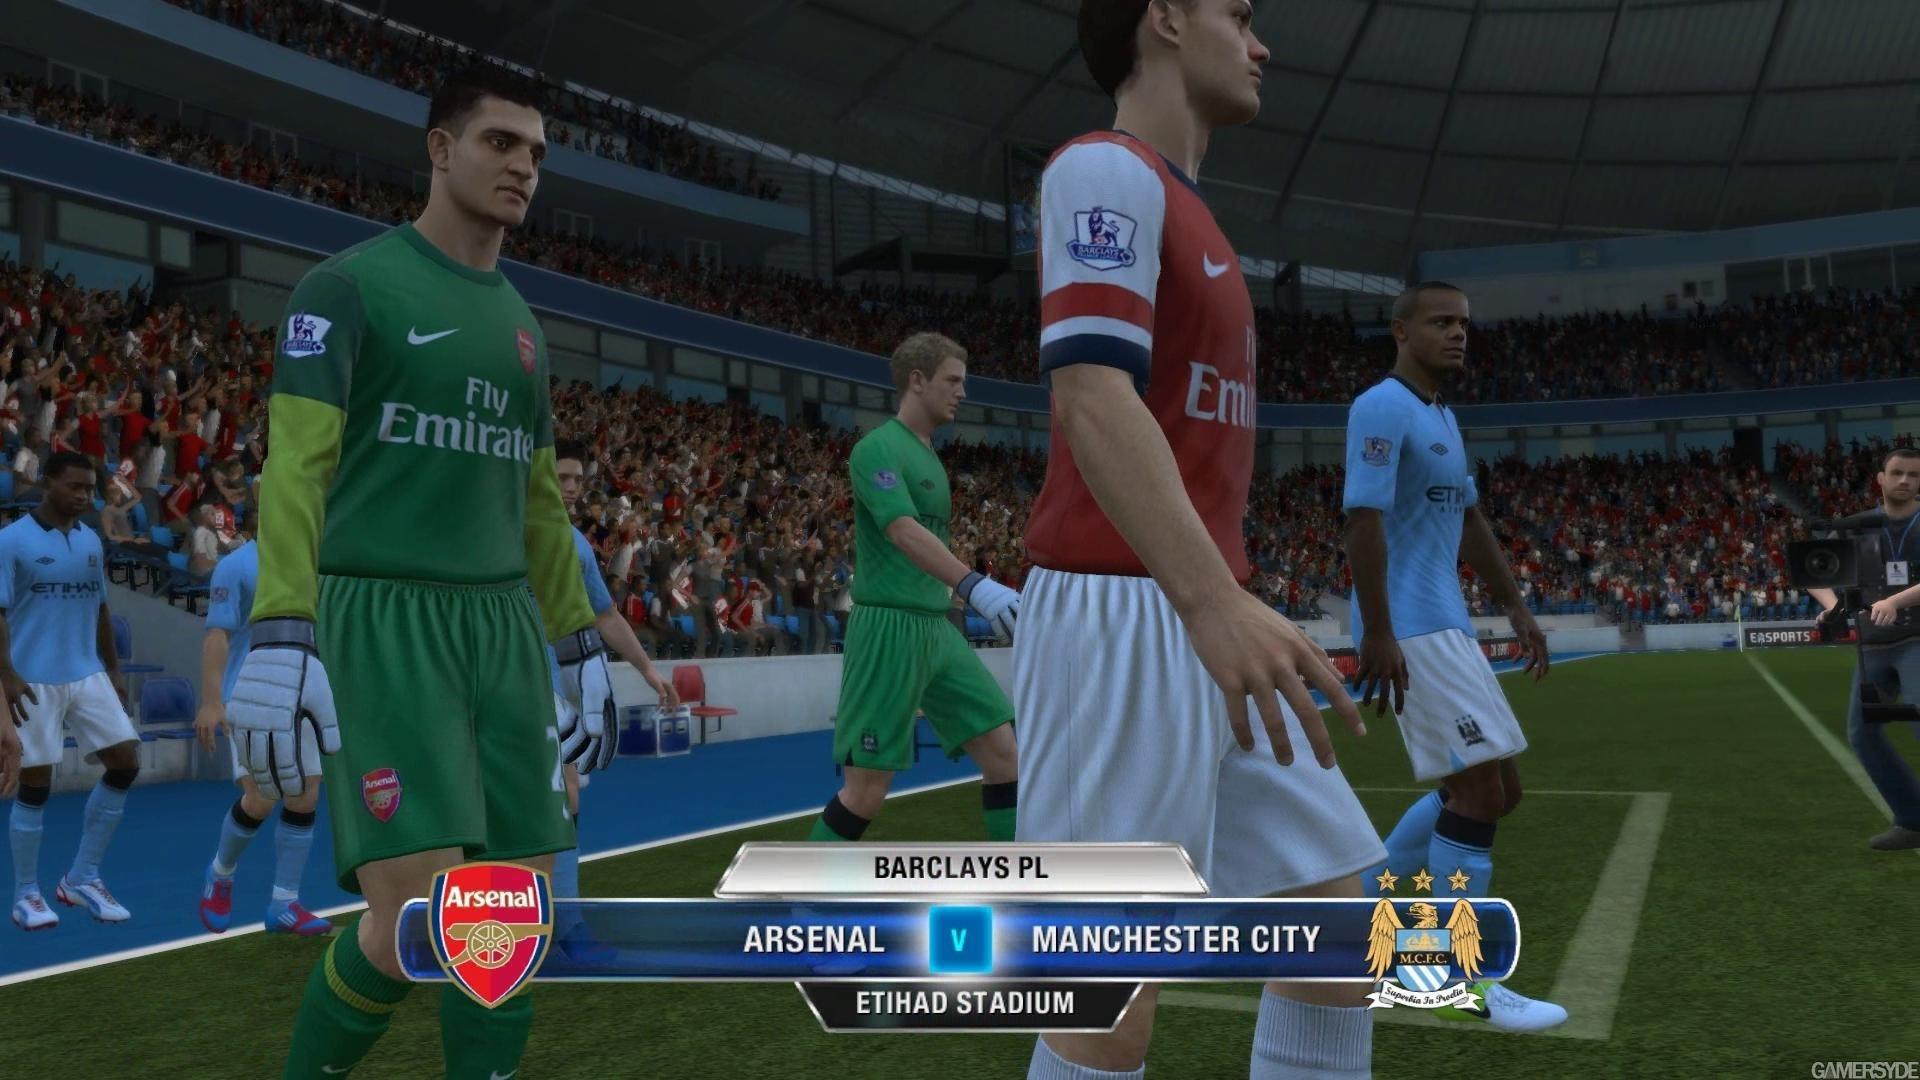 image fifa 13 20261 2509 0003 تصاویر جدید از بازی FIFA 13